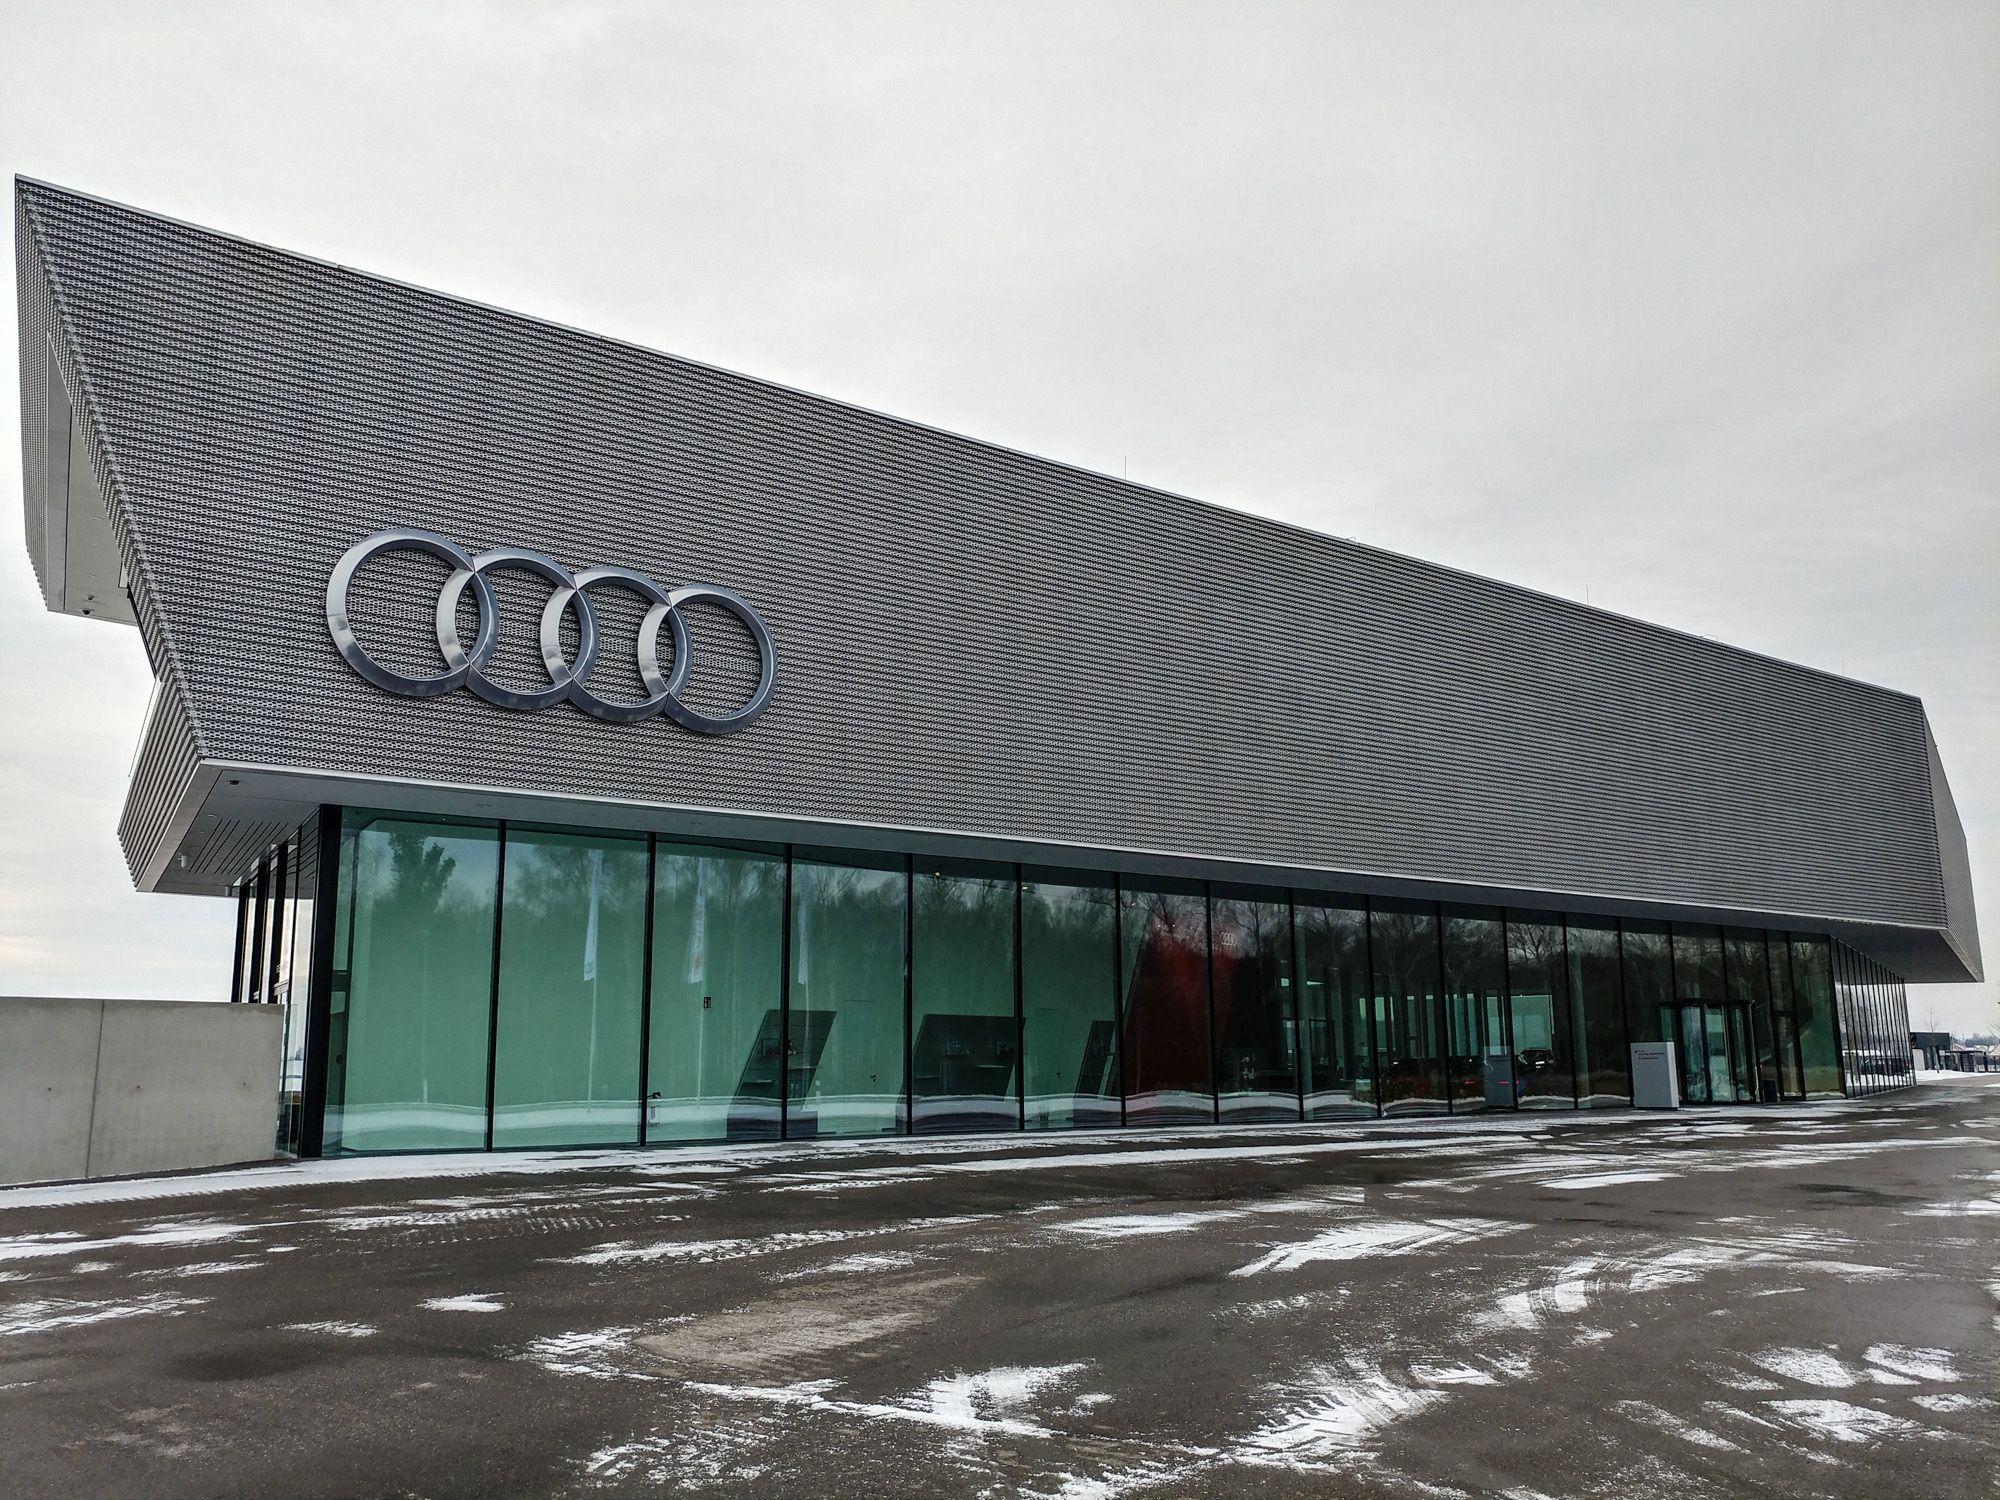 Audi Driving Experience Center Neuburg